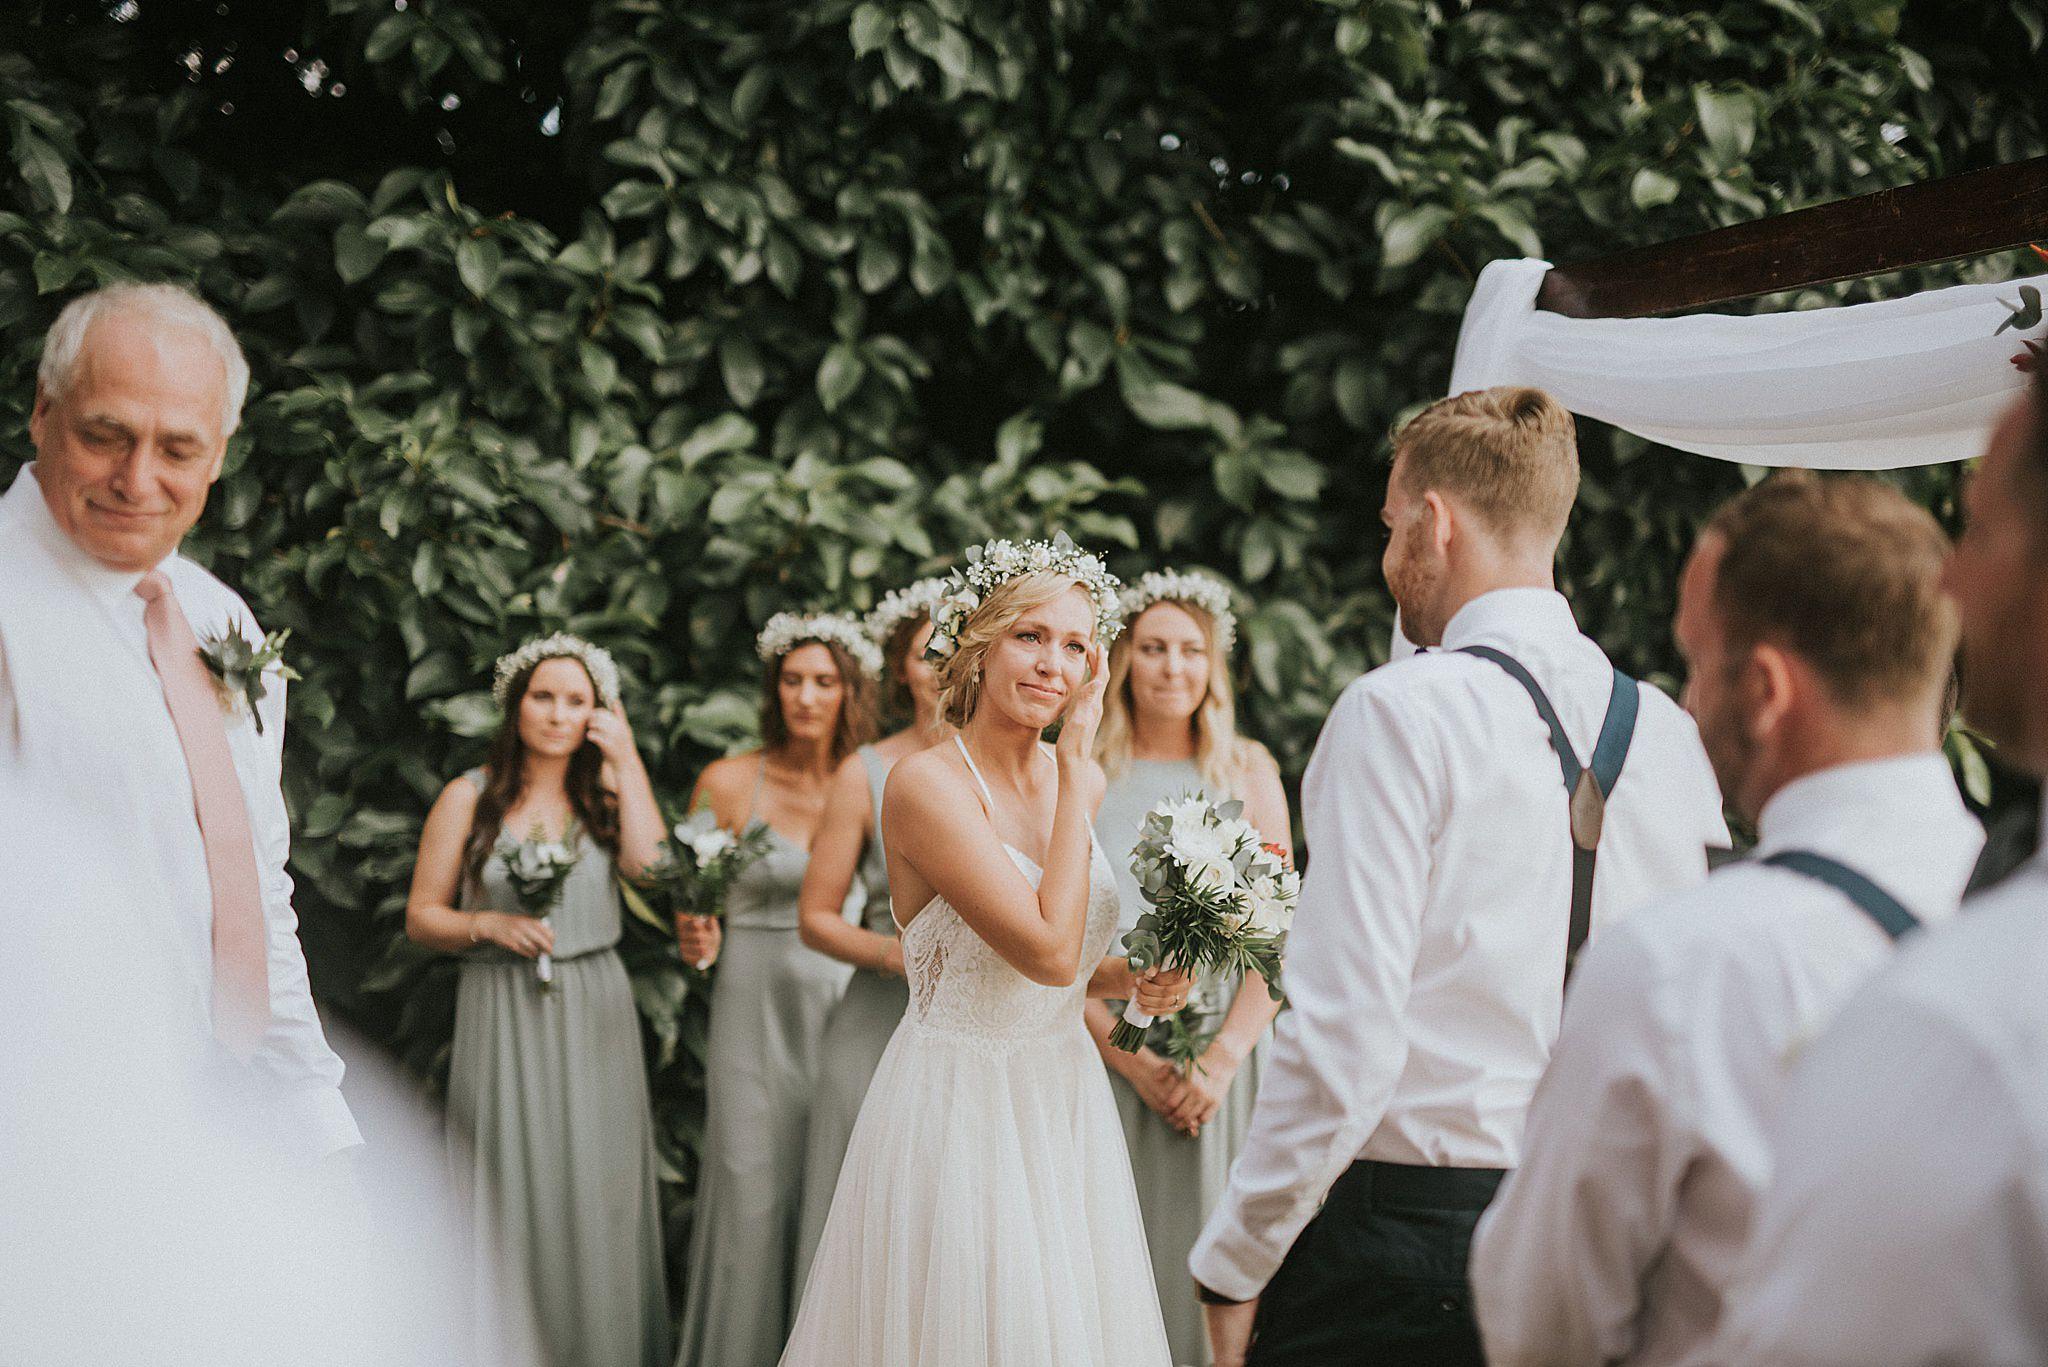 50Kelsey_jacob_beach_wedding_costa_rica_photography_0050.jpg